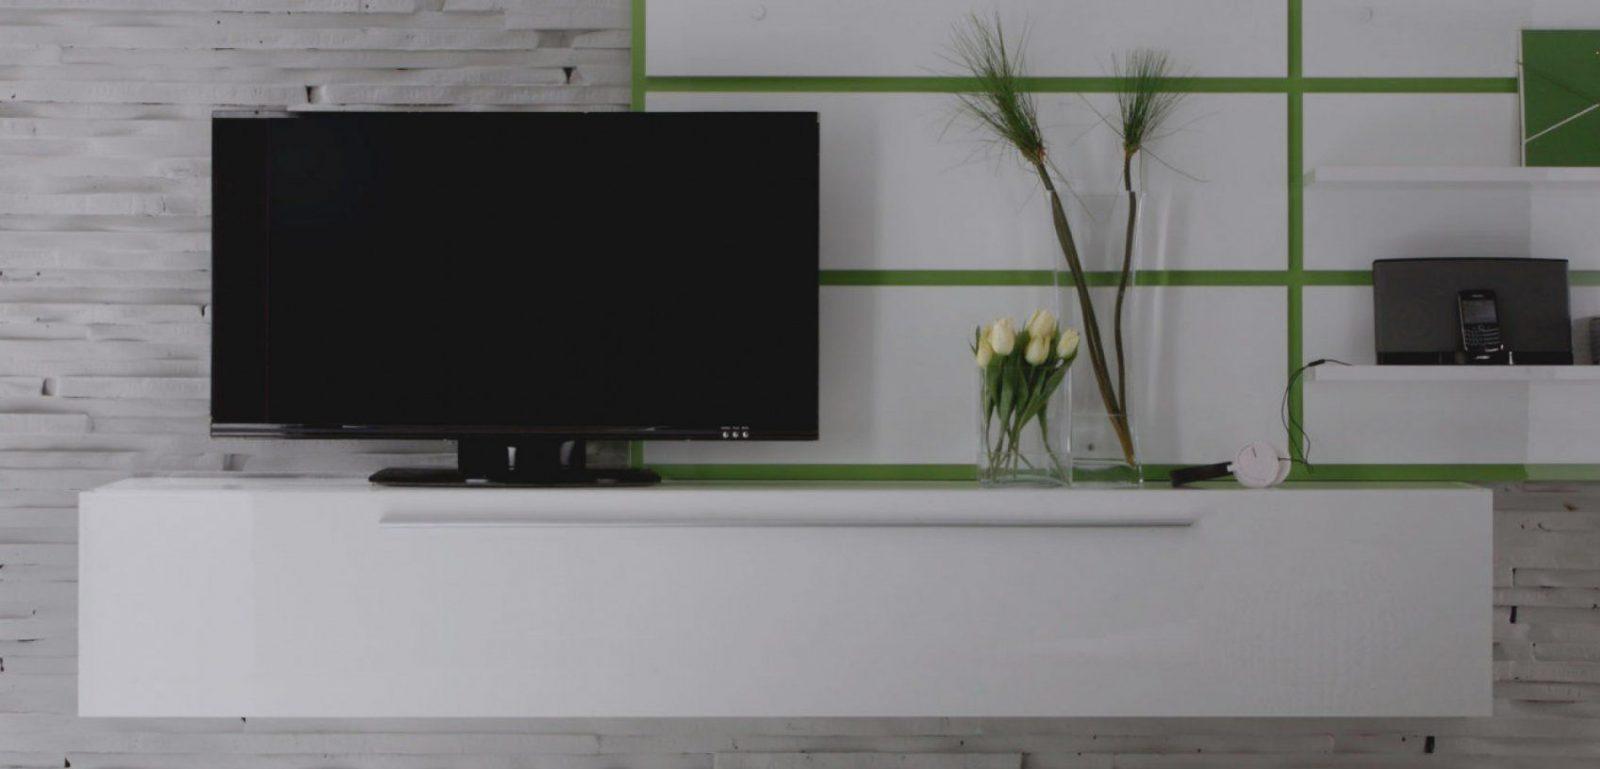 Elegantes Unikat Design Tv Lowboard Hochglanz Board Laura In Weiß von Lowboard Weiß Hochglanz Hängend Photo